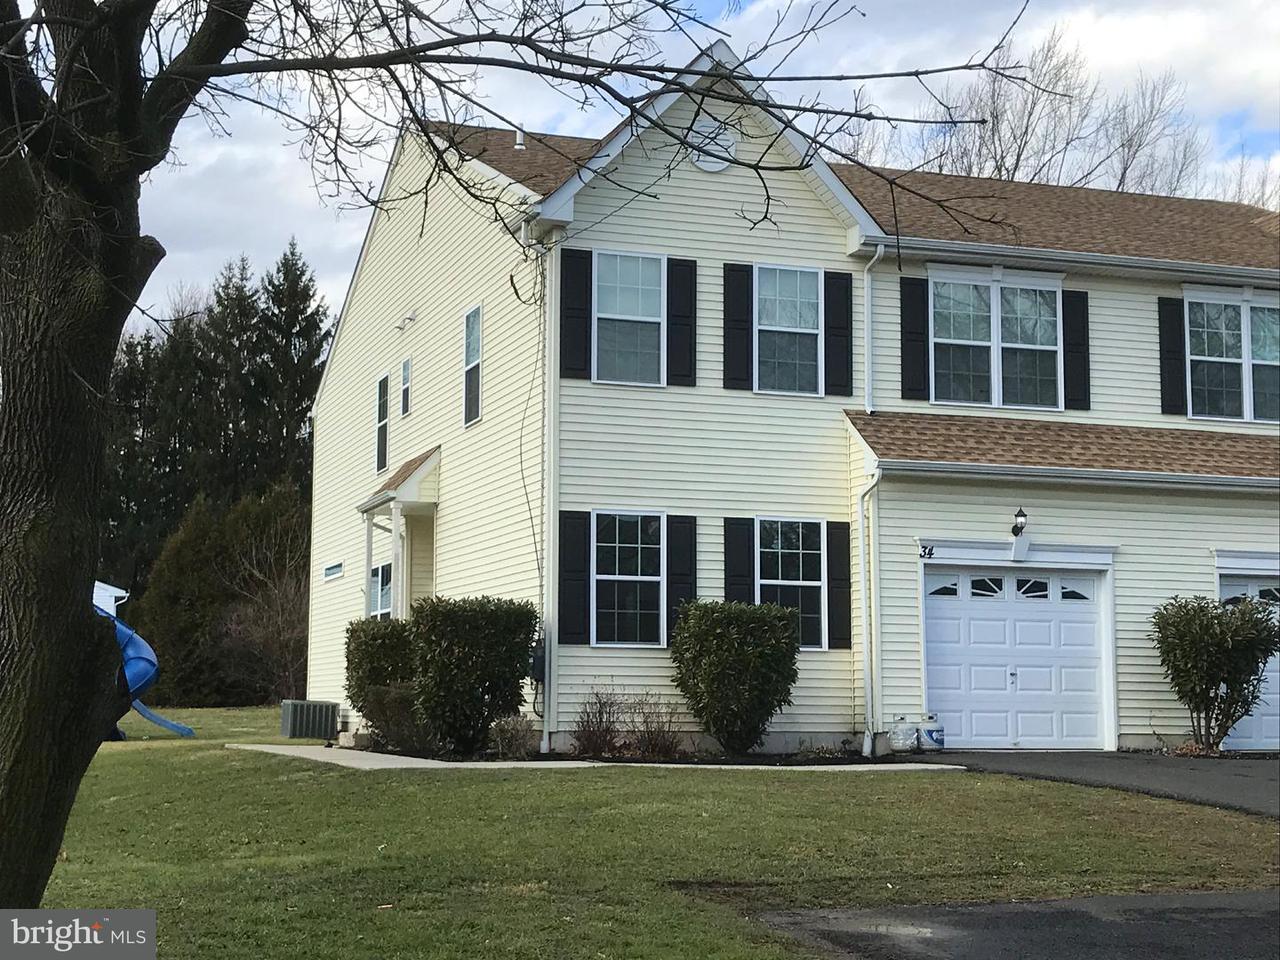 Casa unifamiliar adosada (Townhouse) por un Venta en 34 MAPLE Avenue Line Lexington, Pennsylvania 18932 Estados Unidos